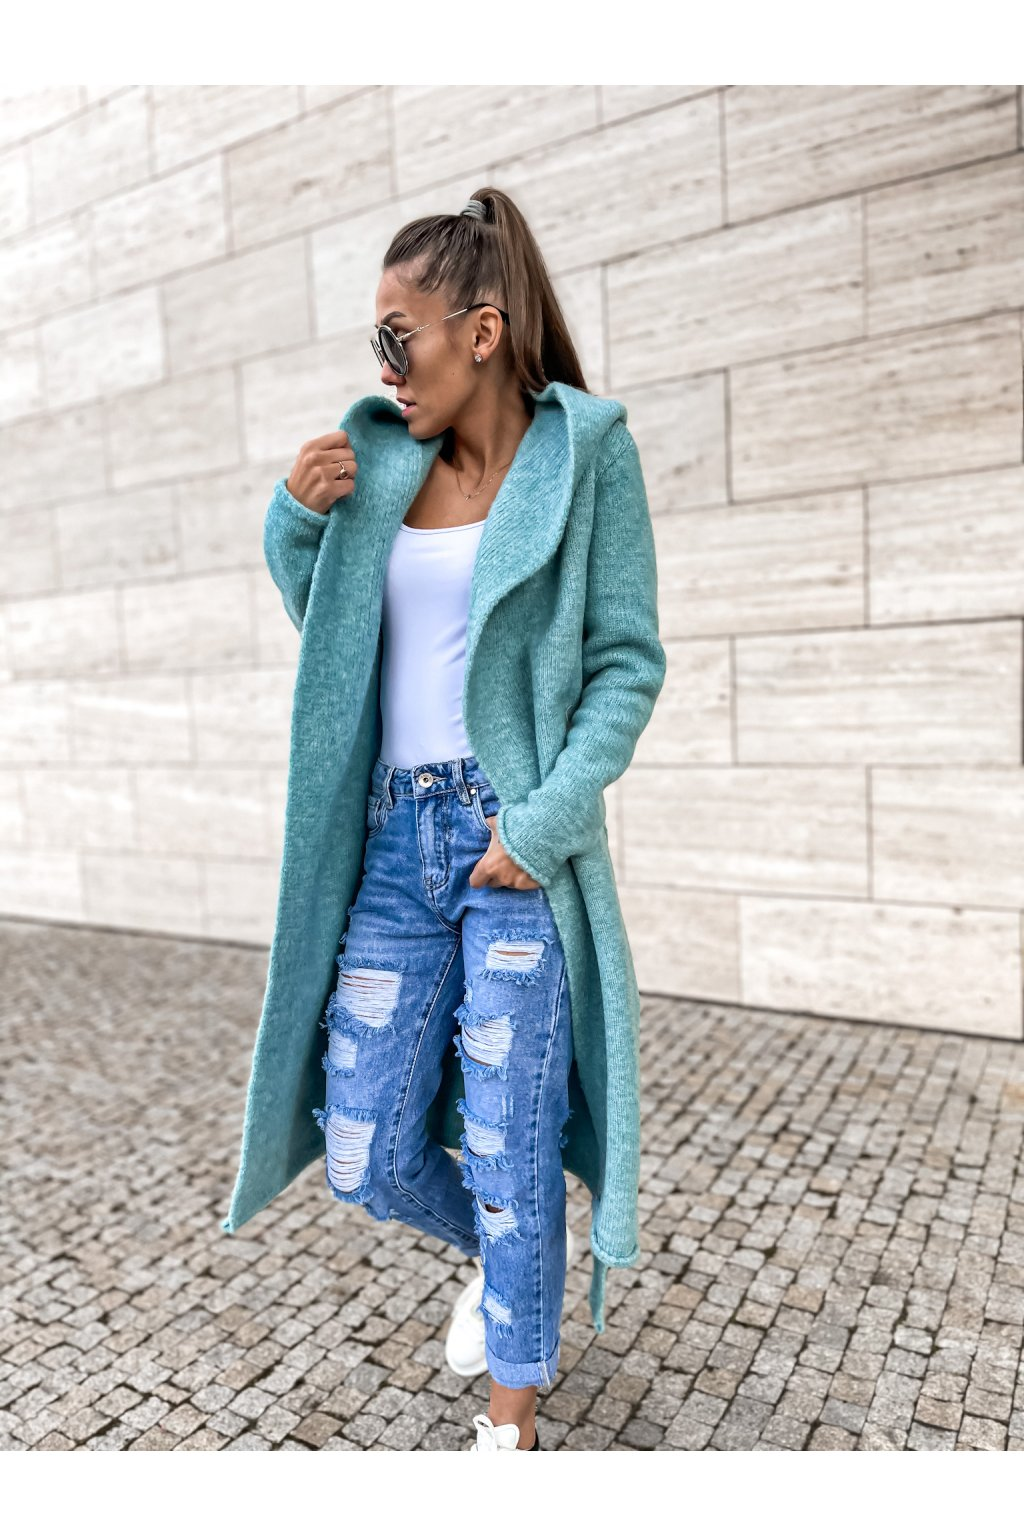 damsky cardigan s kapuci long ocean blue shopat cz 1